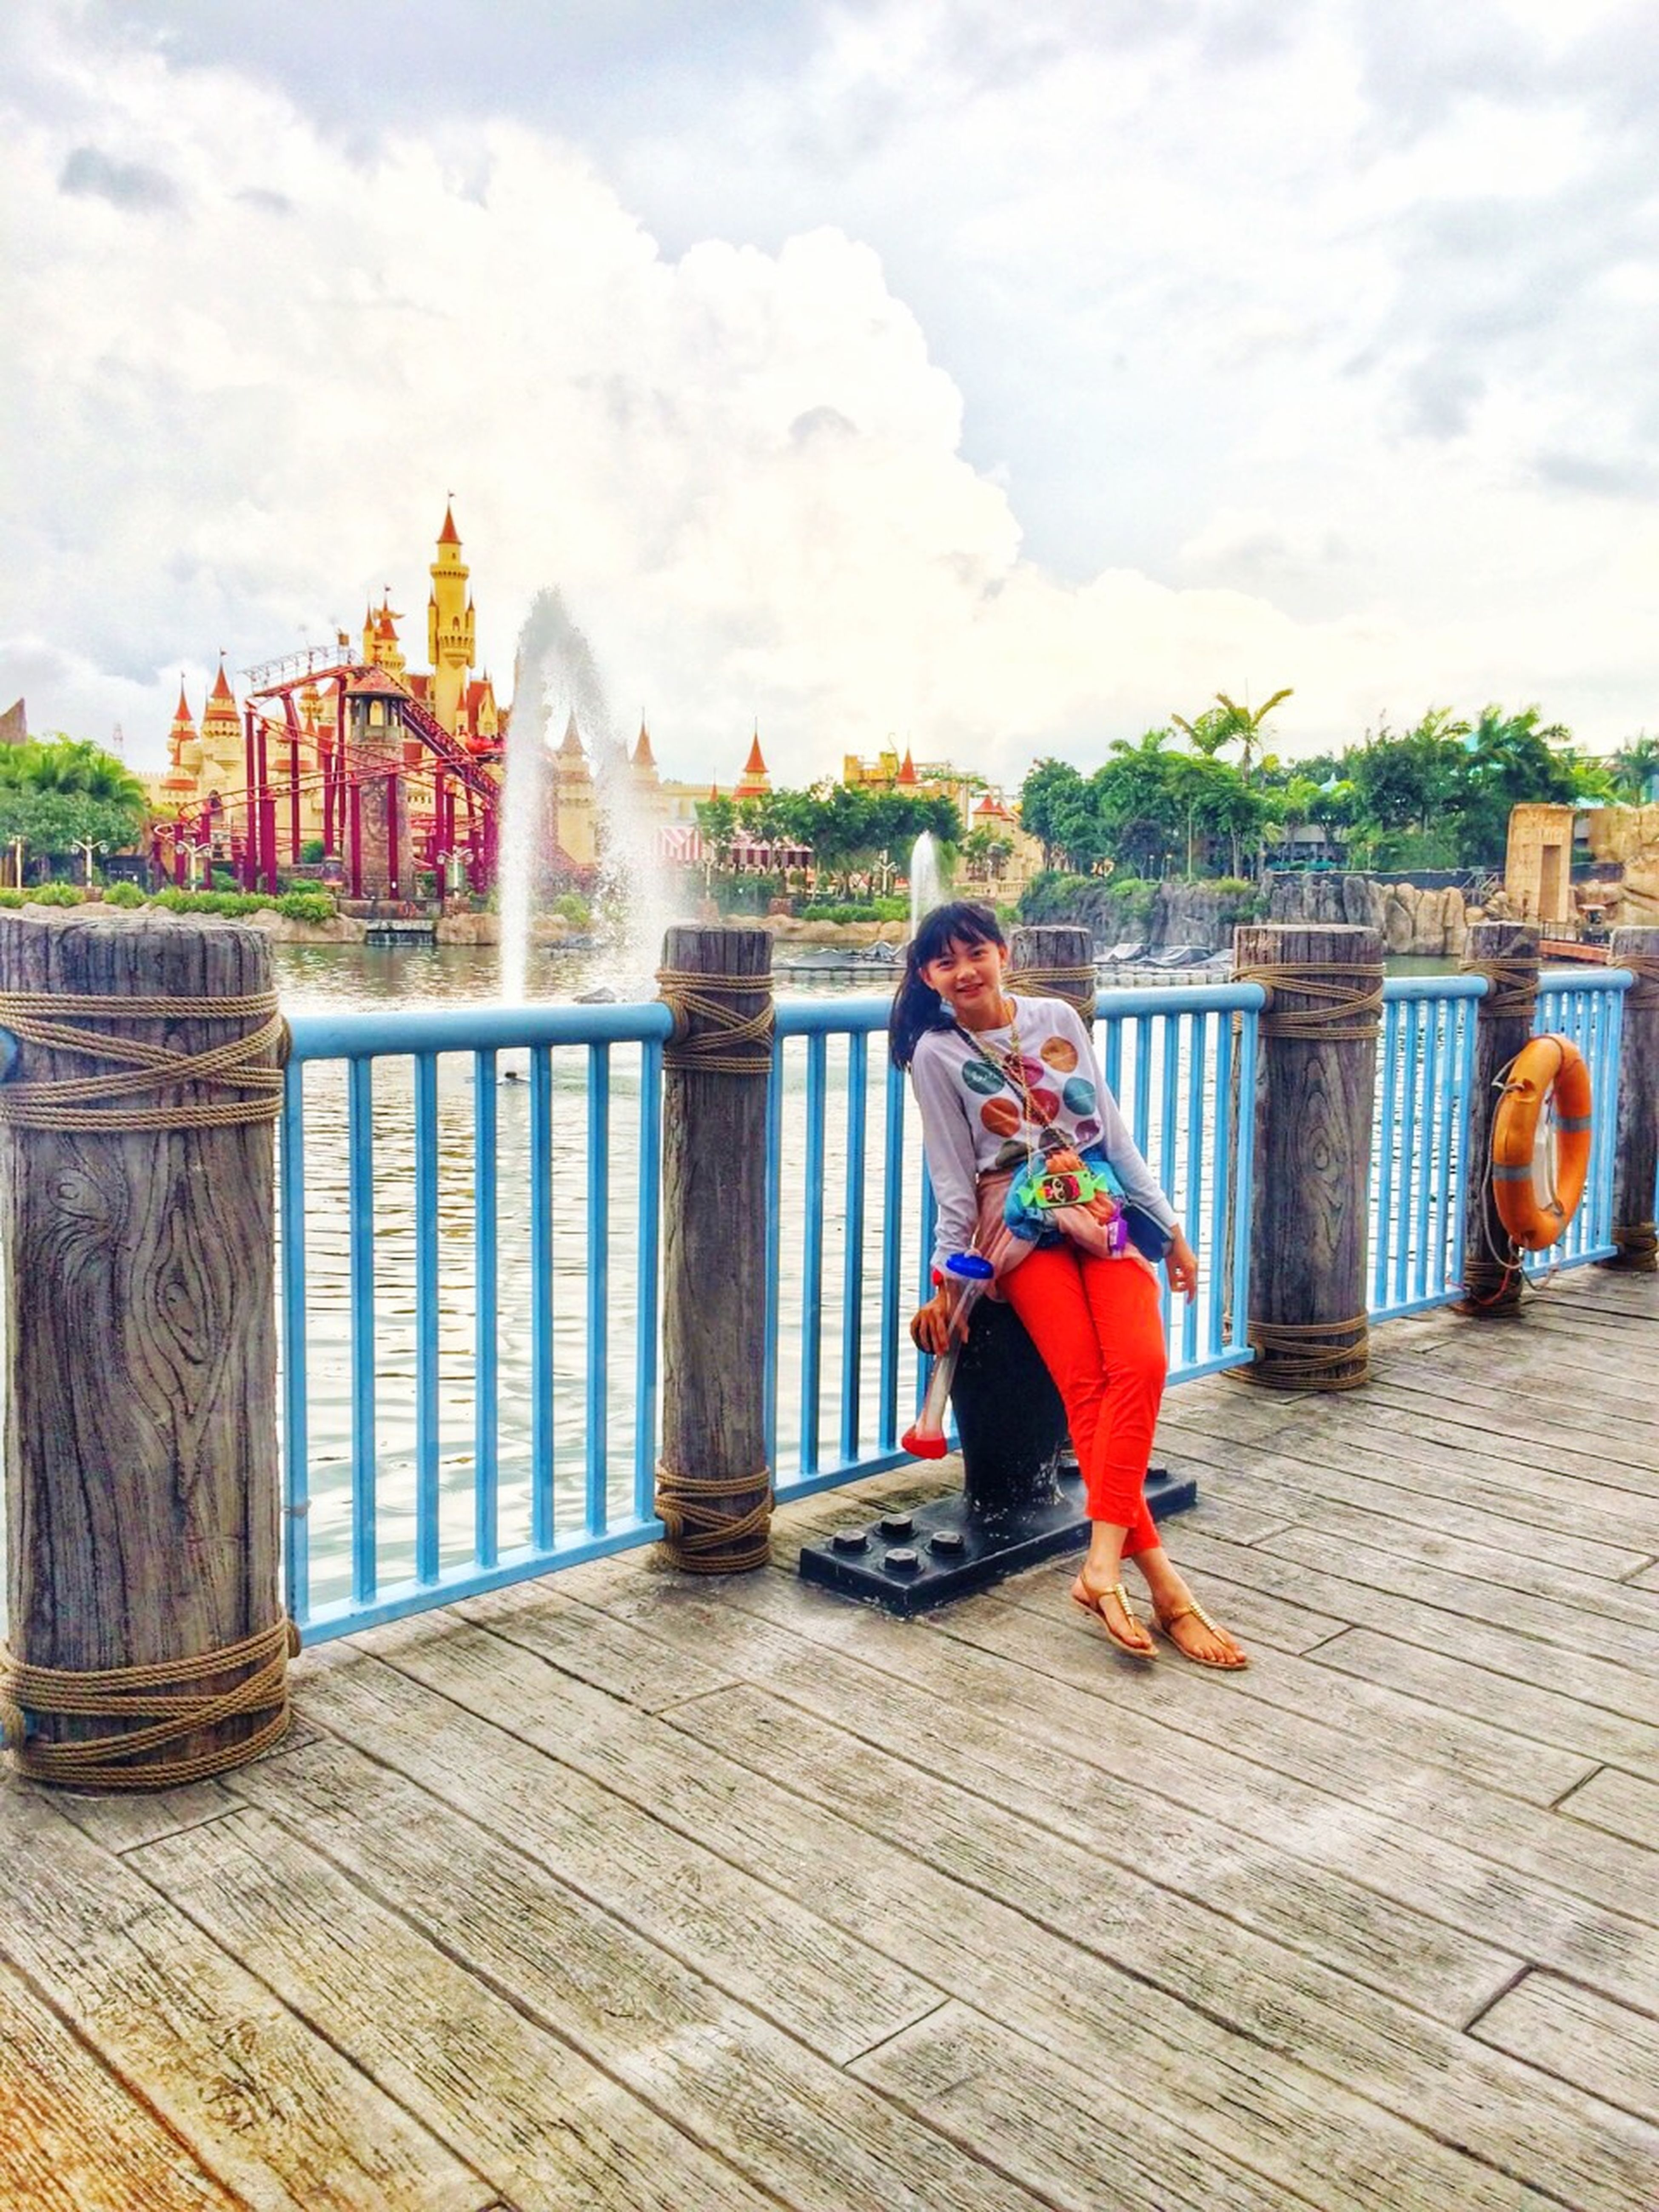 Throwback To Singapore Universal Studios  I ❤️ SG